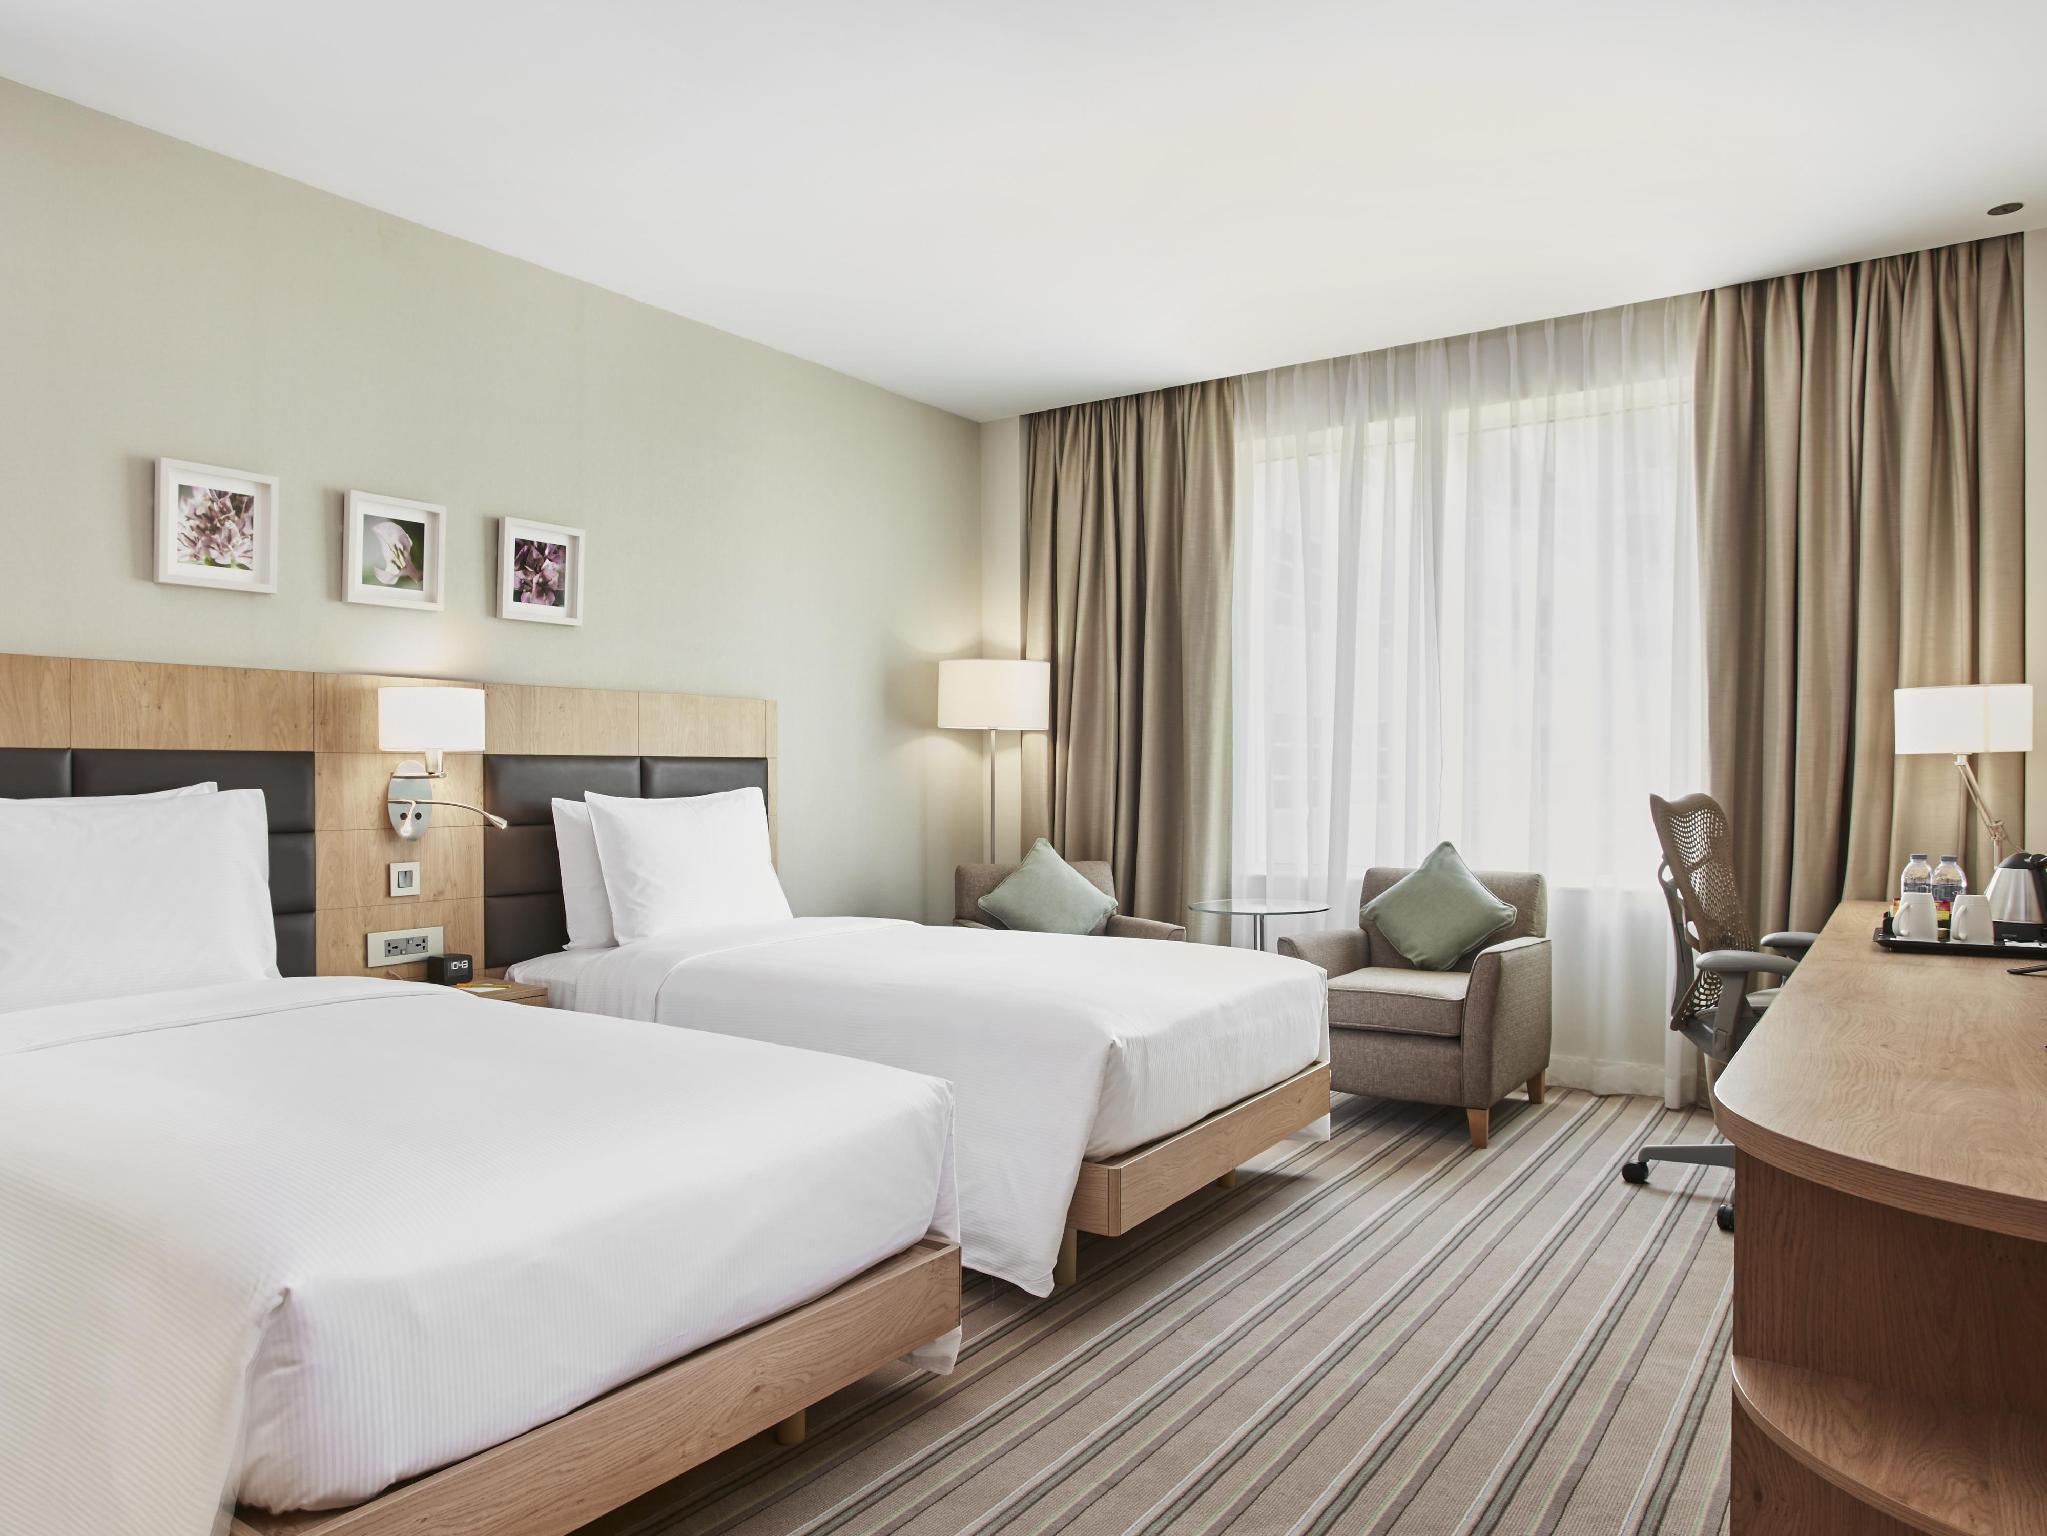 Hilton garden inn dubai mall of the emirates in united arab emirates room deals photos reviews for Hilton garden inn dubai mall of the emirates